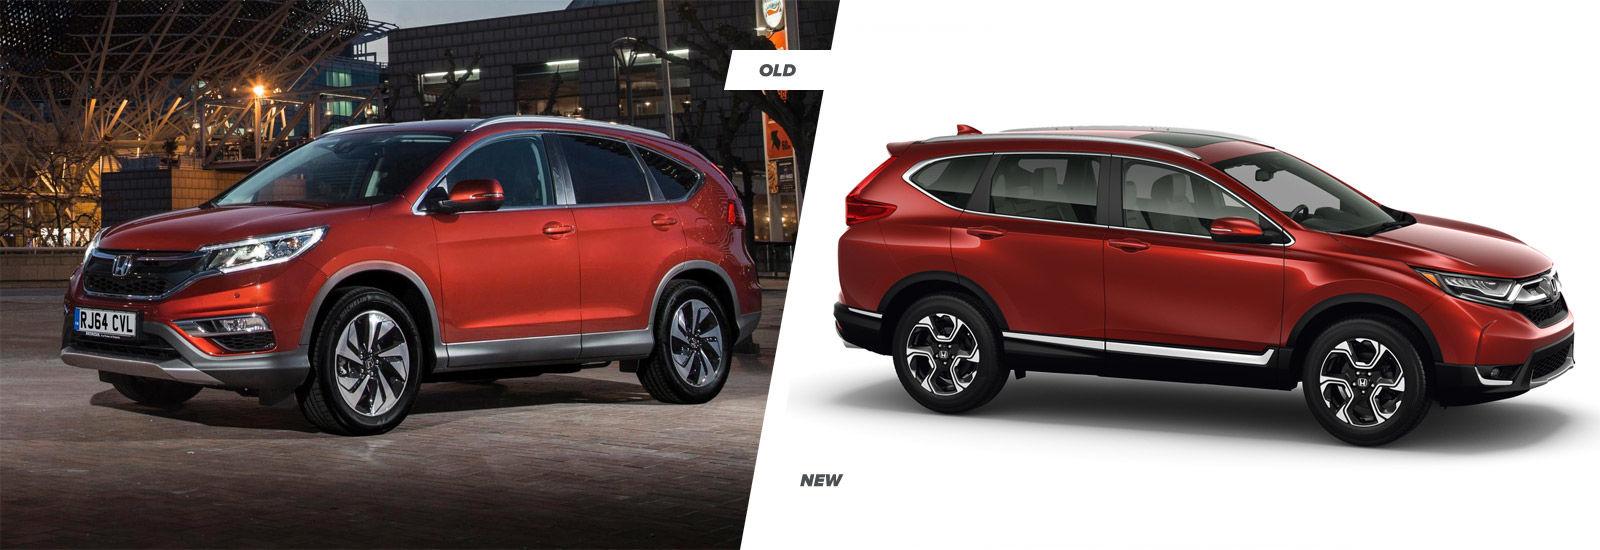 2017 Honda CR-V old vs new compared   carwow